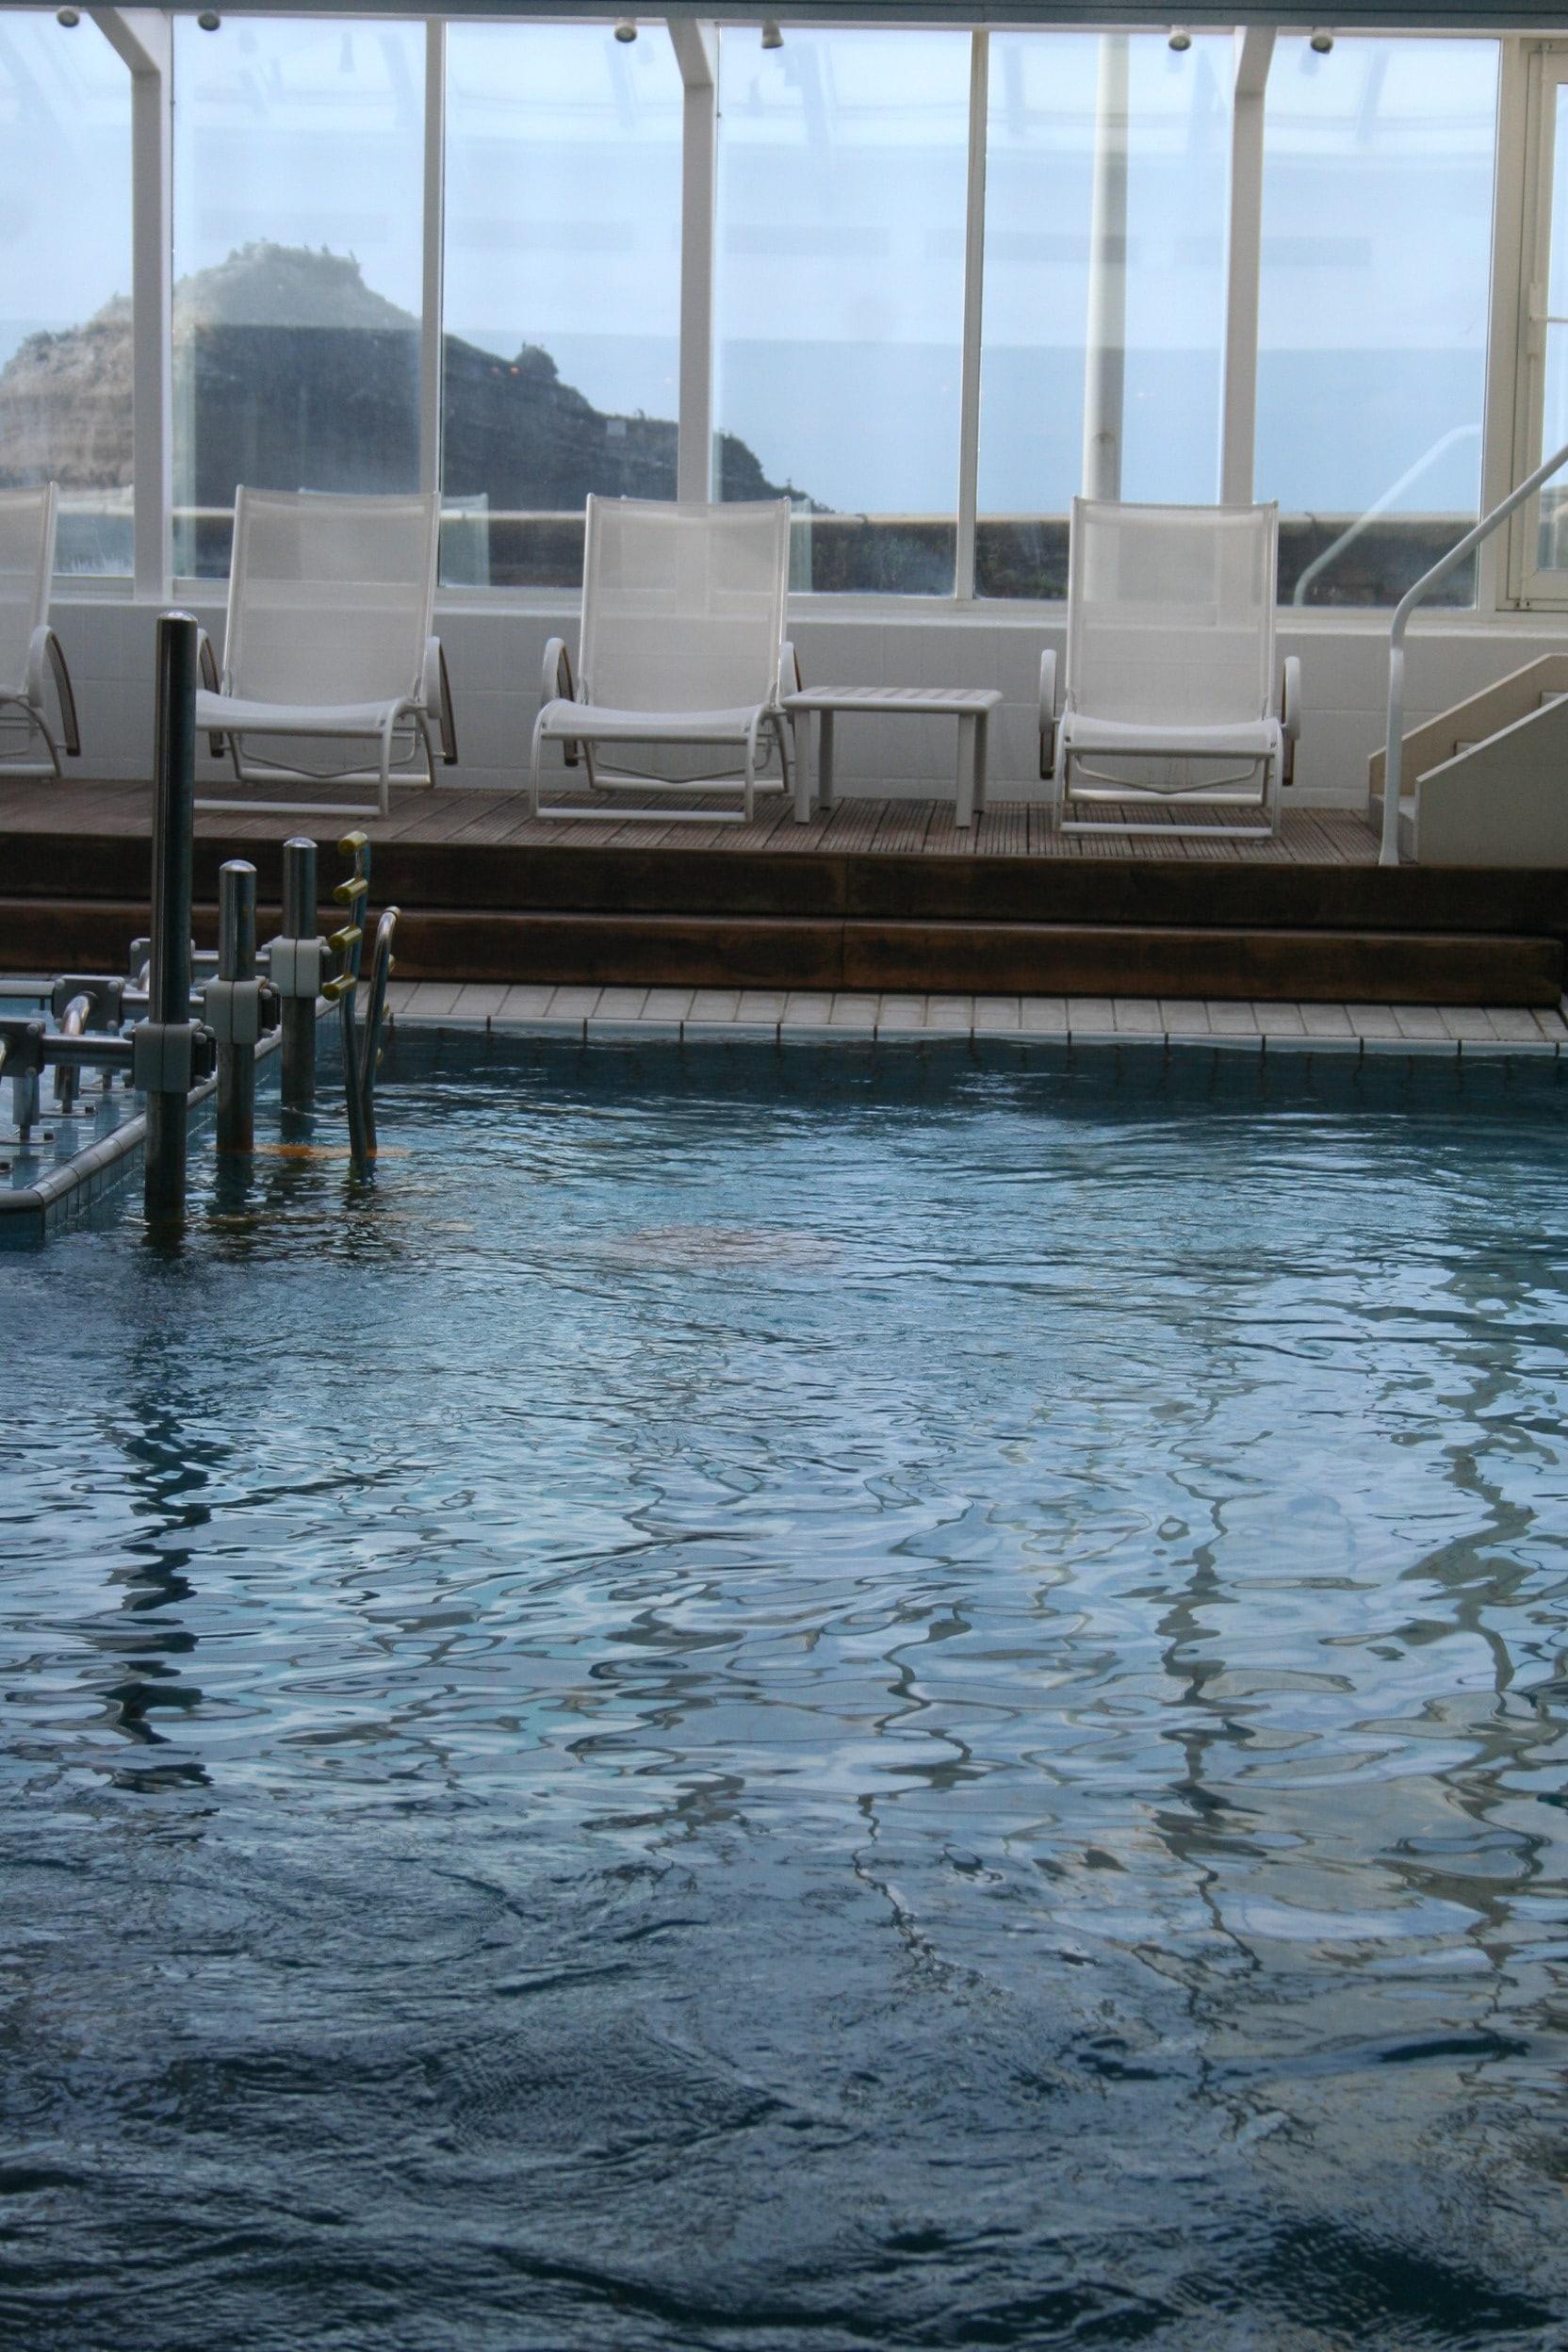 sejour-bienetre-thalasso-sofitel-miramar-biarritz-piscine ©CDT64